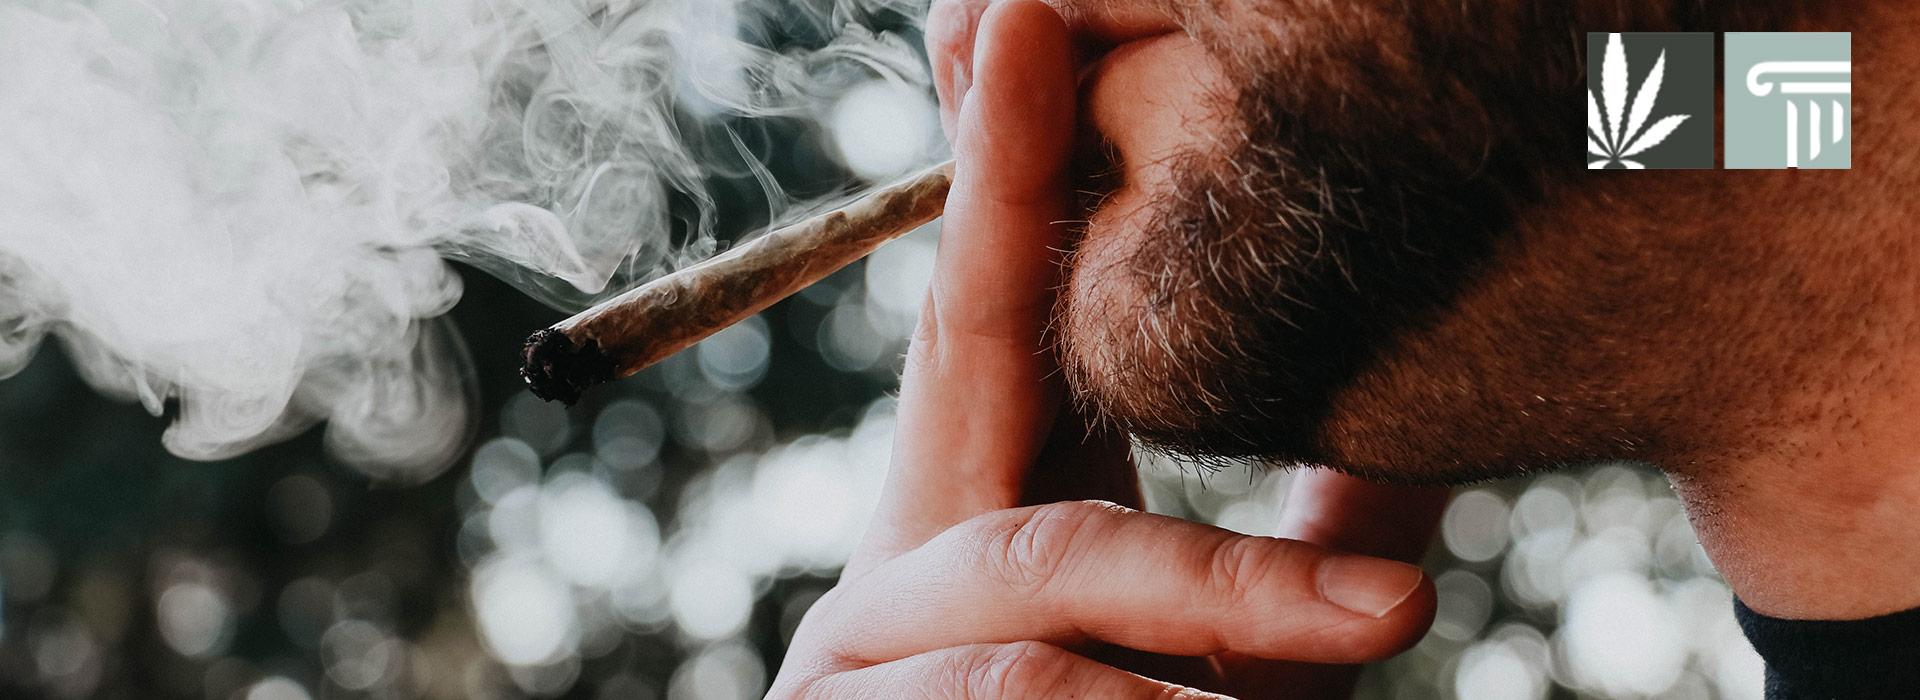 iowa support marijuana legalization